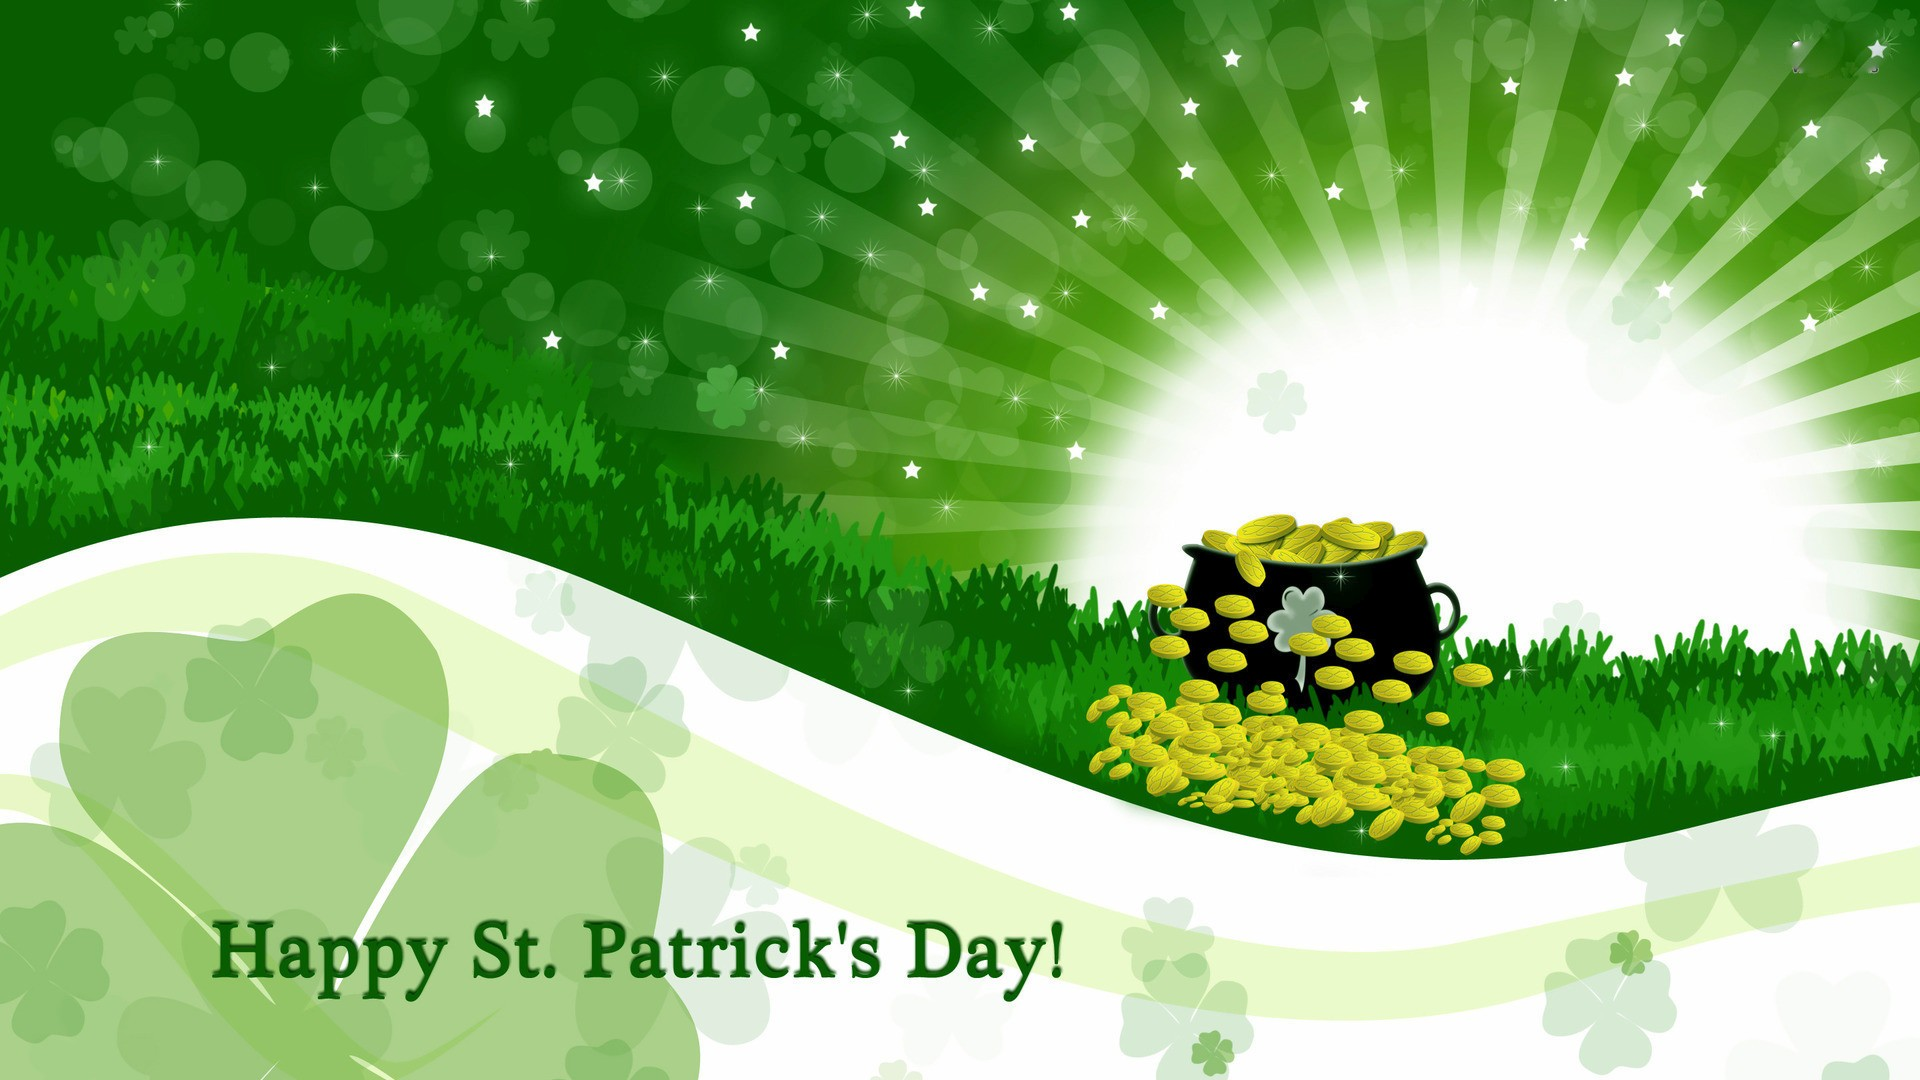 St. Patrick's Day 2021 wallpaper for desktop